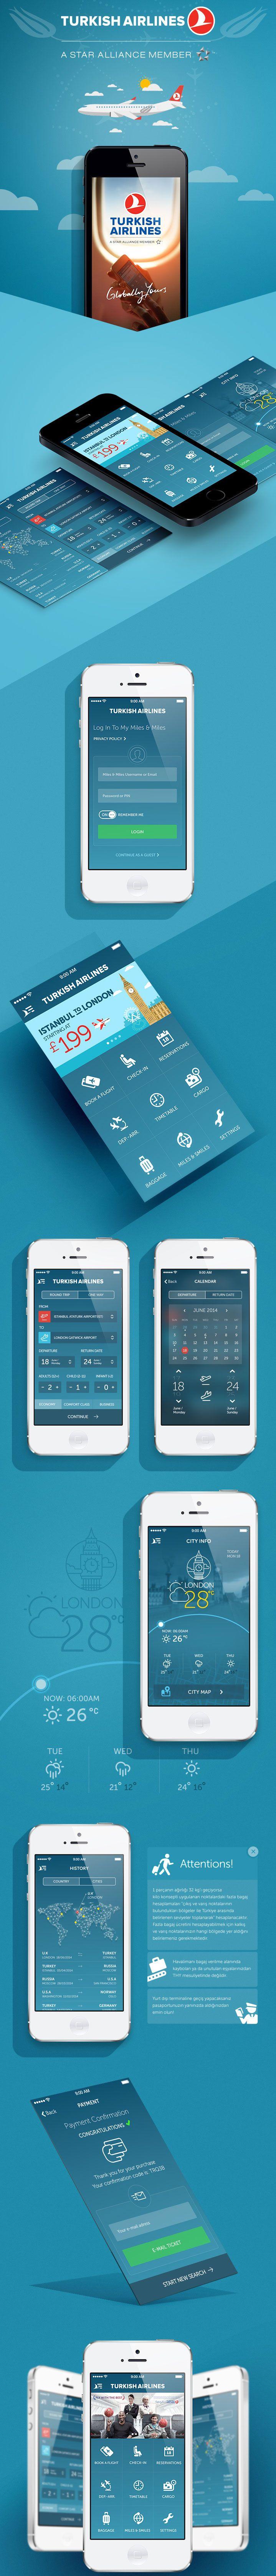 Turkish Airlines App Redesign